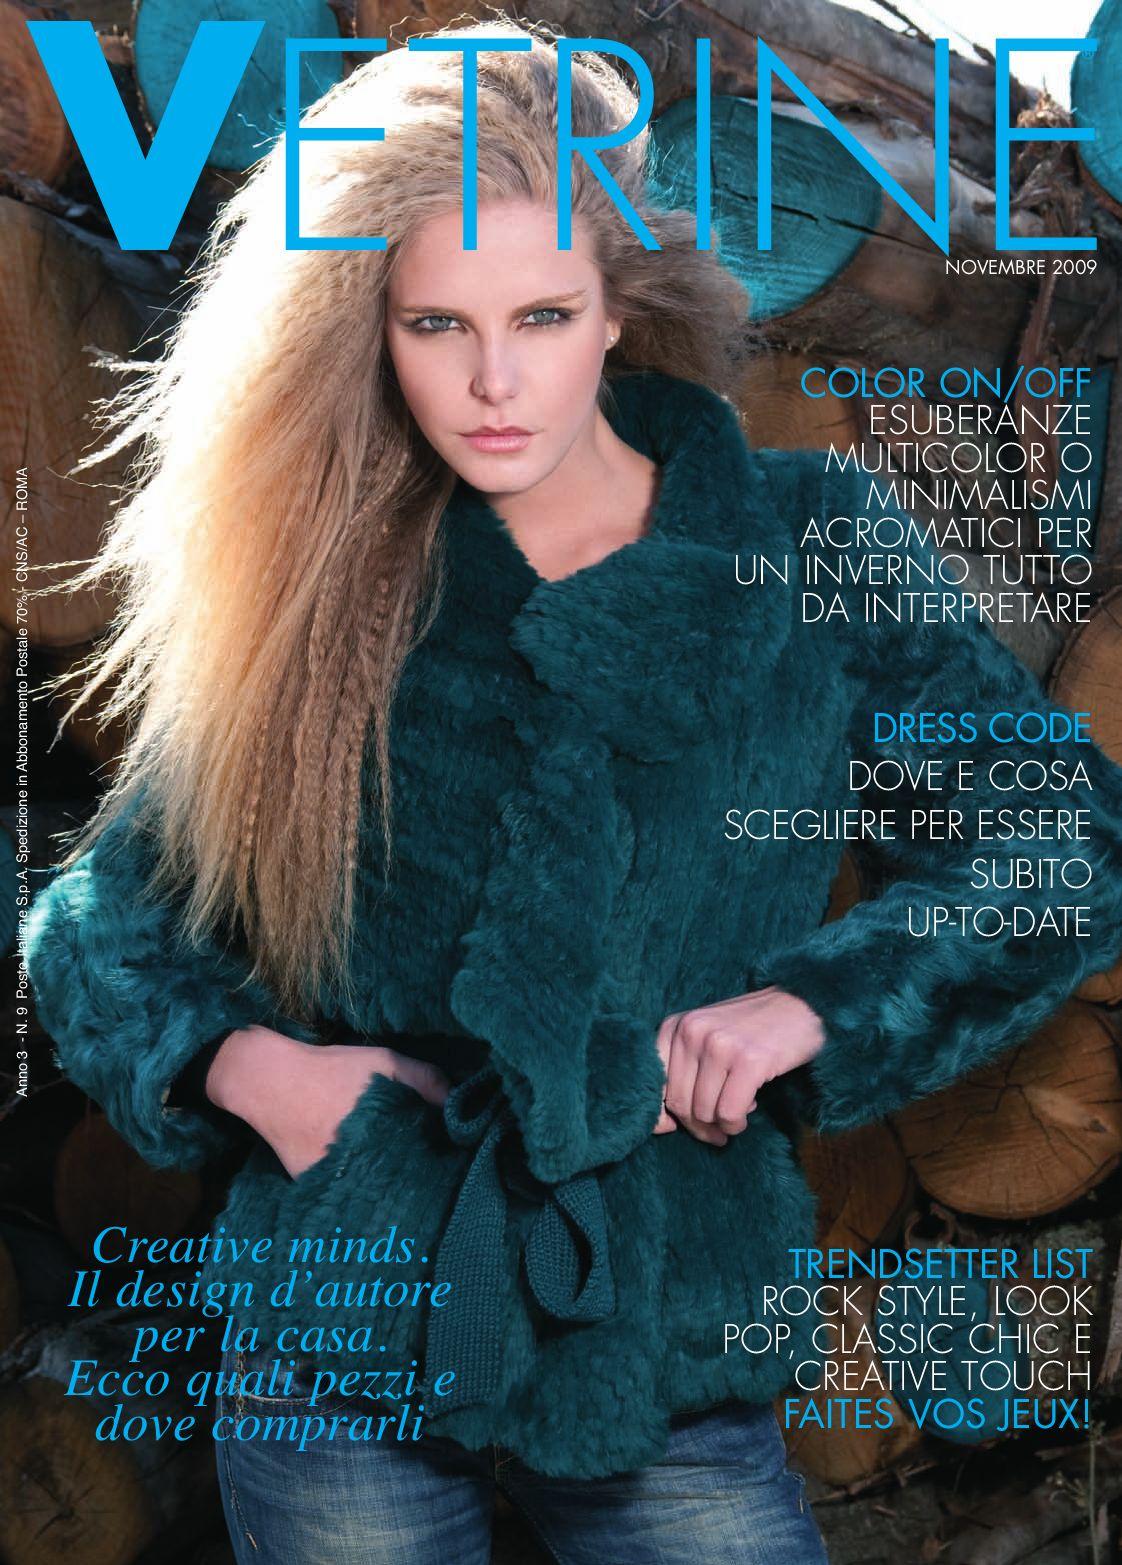 Vetrine 40 Aprile 2010 by EGGMEDIA S.R.L. - issuu